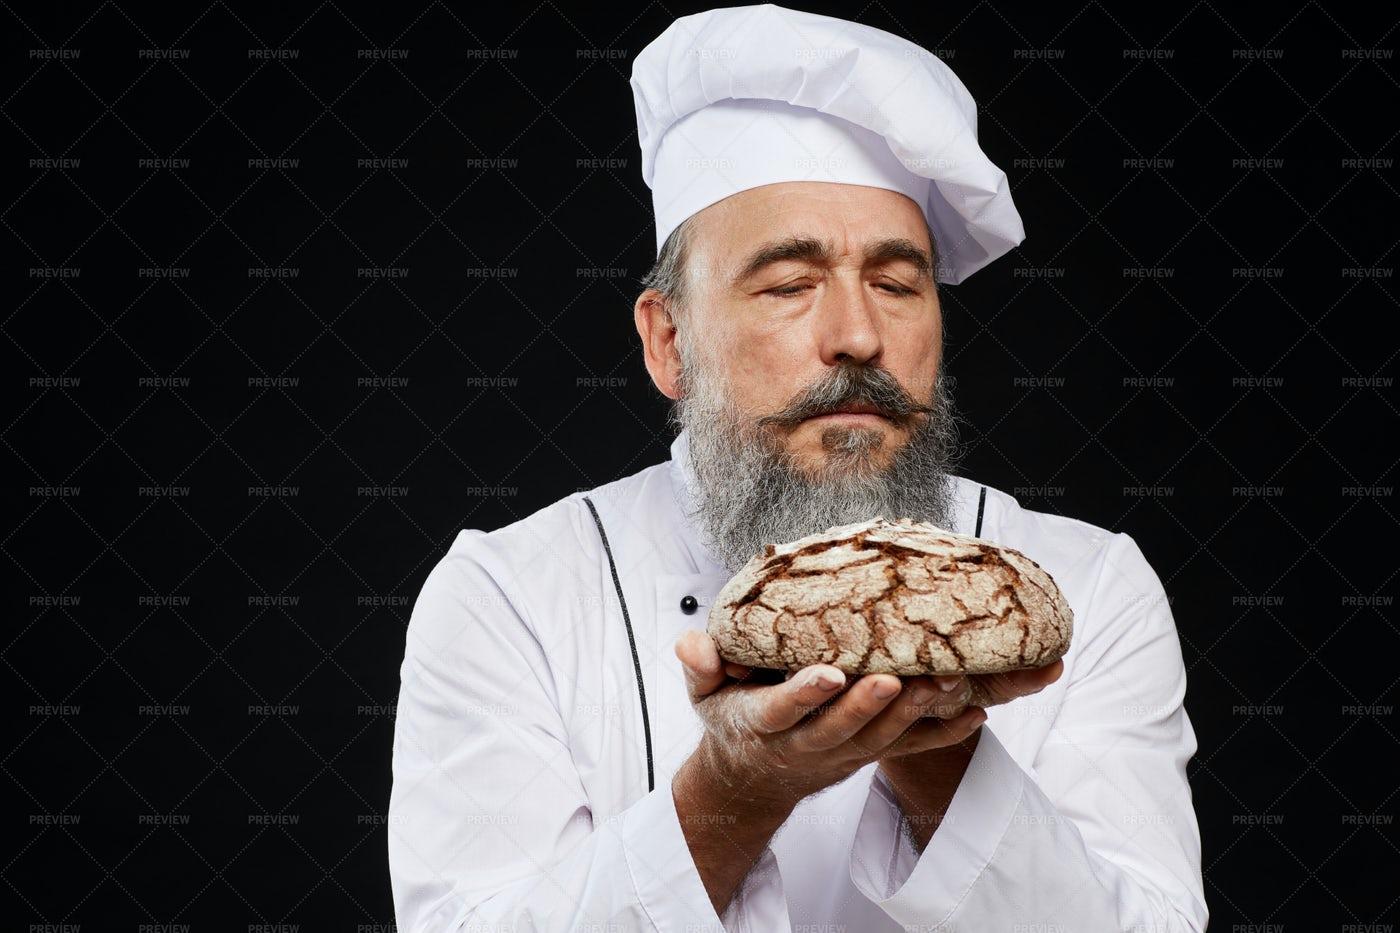 Bearded Baker Holding Fresh Bread: Stock Photos